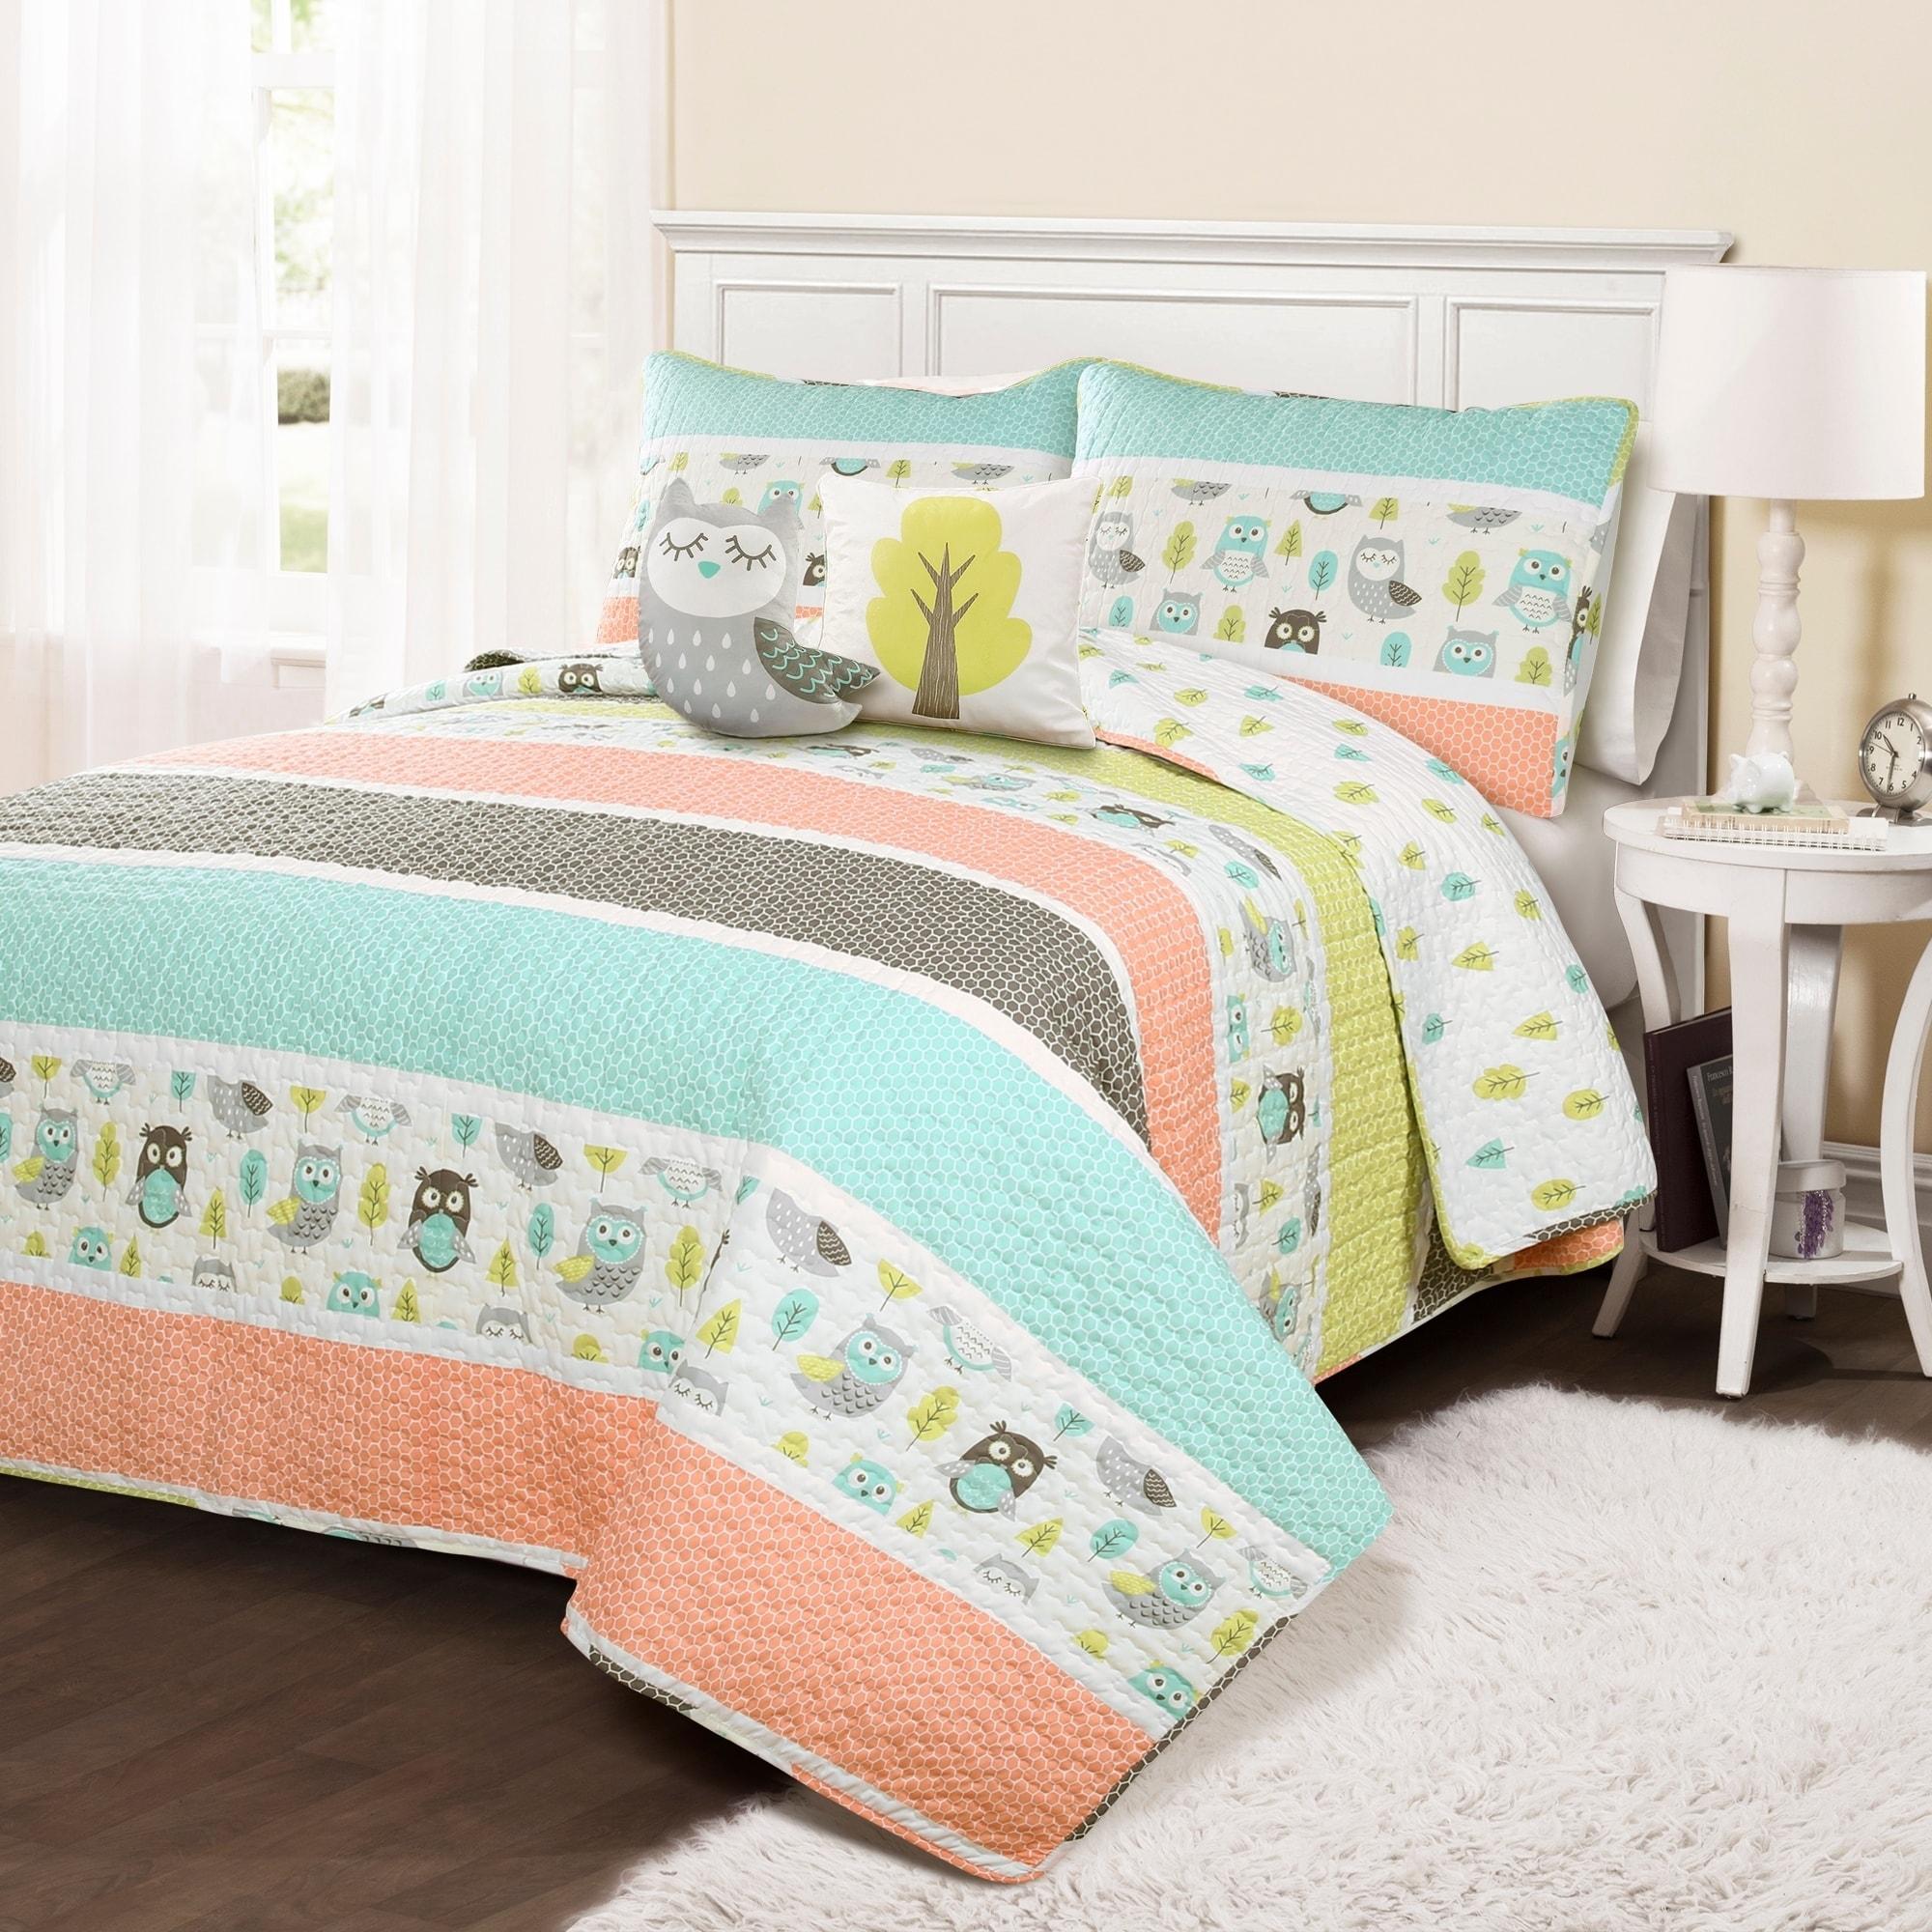 Aiyana Bedding 3 Piece Bedspread Coverlet Quilt Set